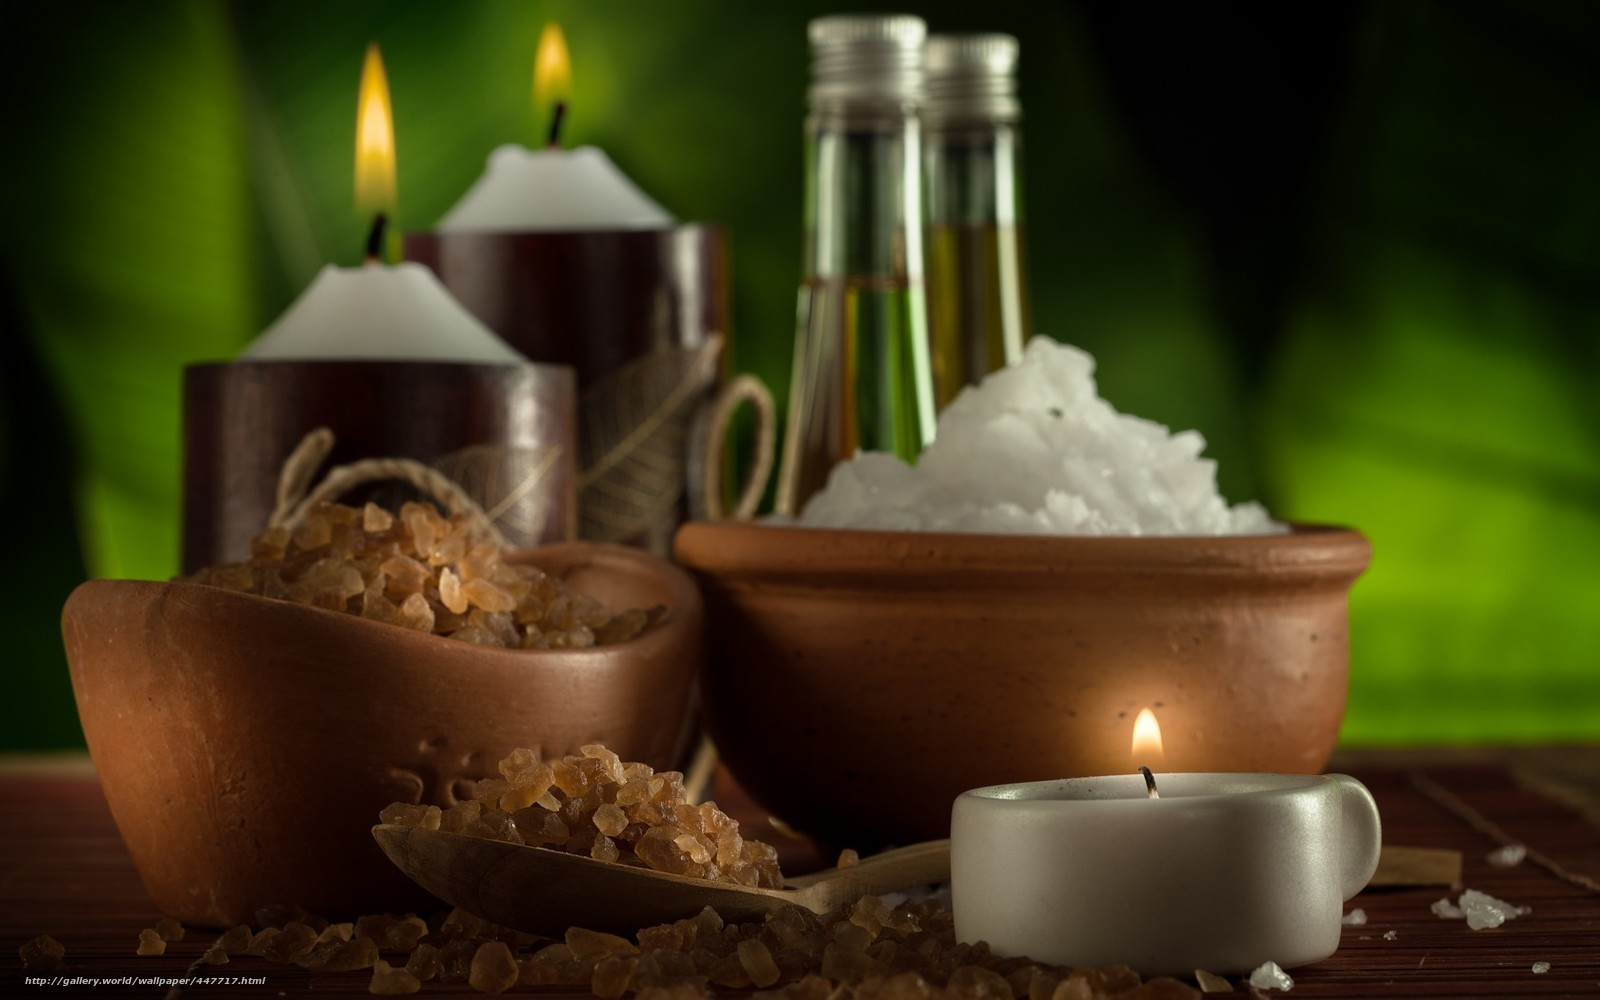 Download wallpaper spa bowls salt candle free desktop for Salon wallpaper